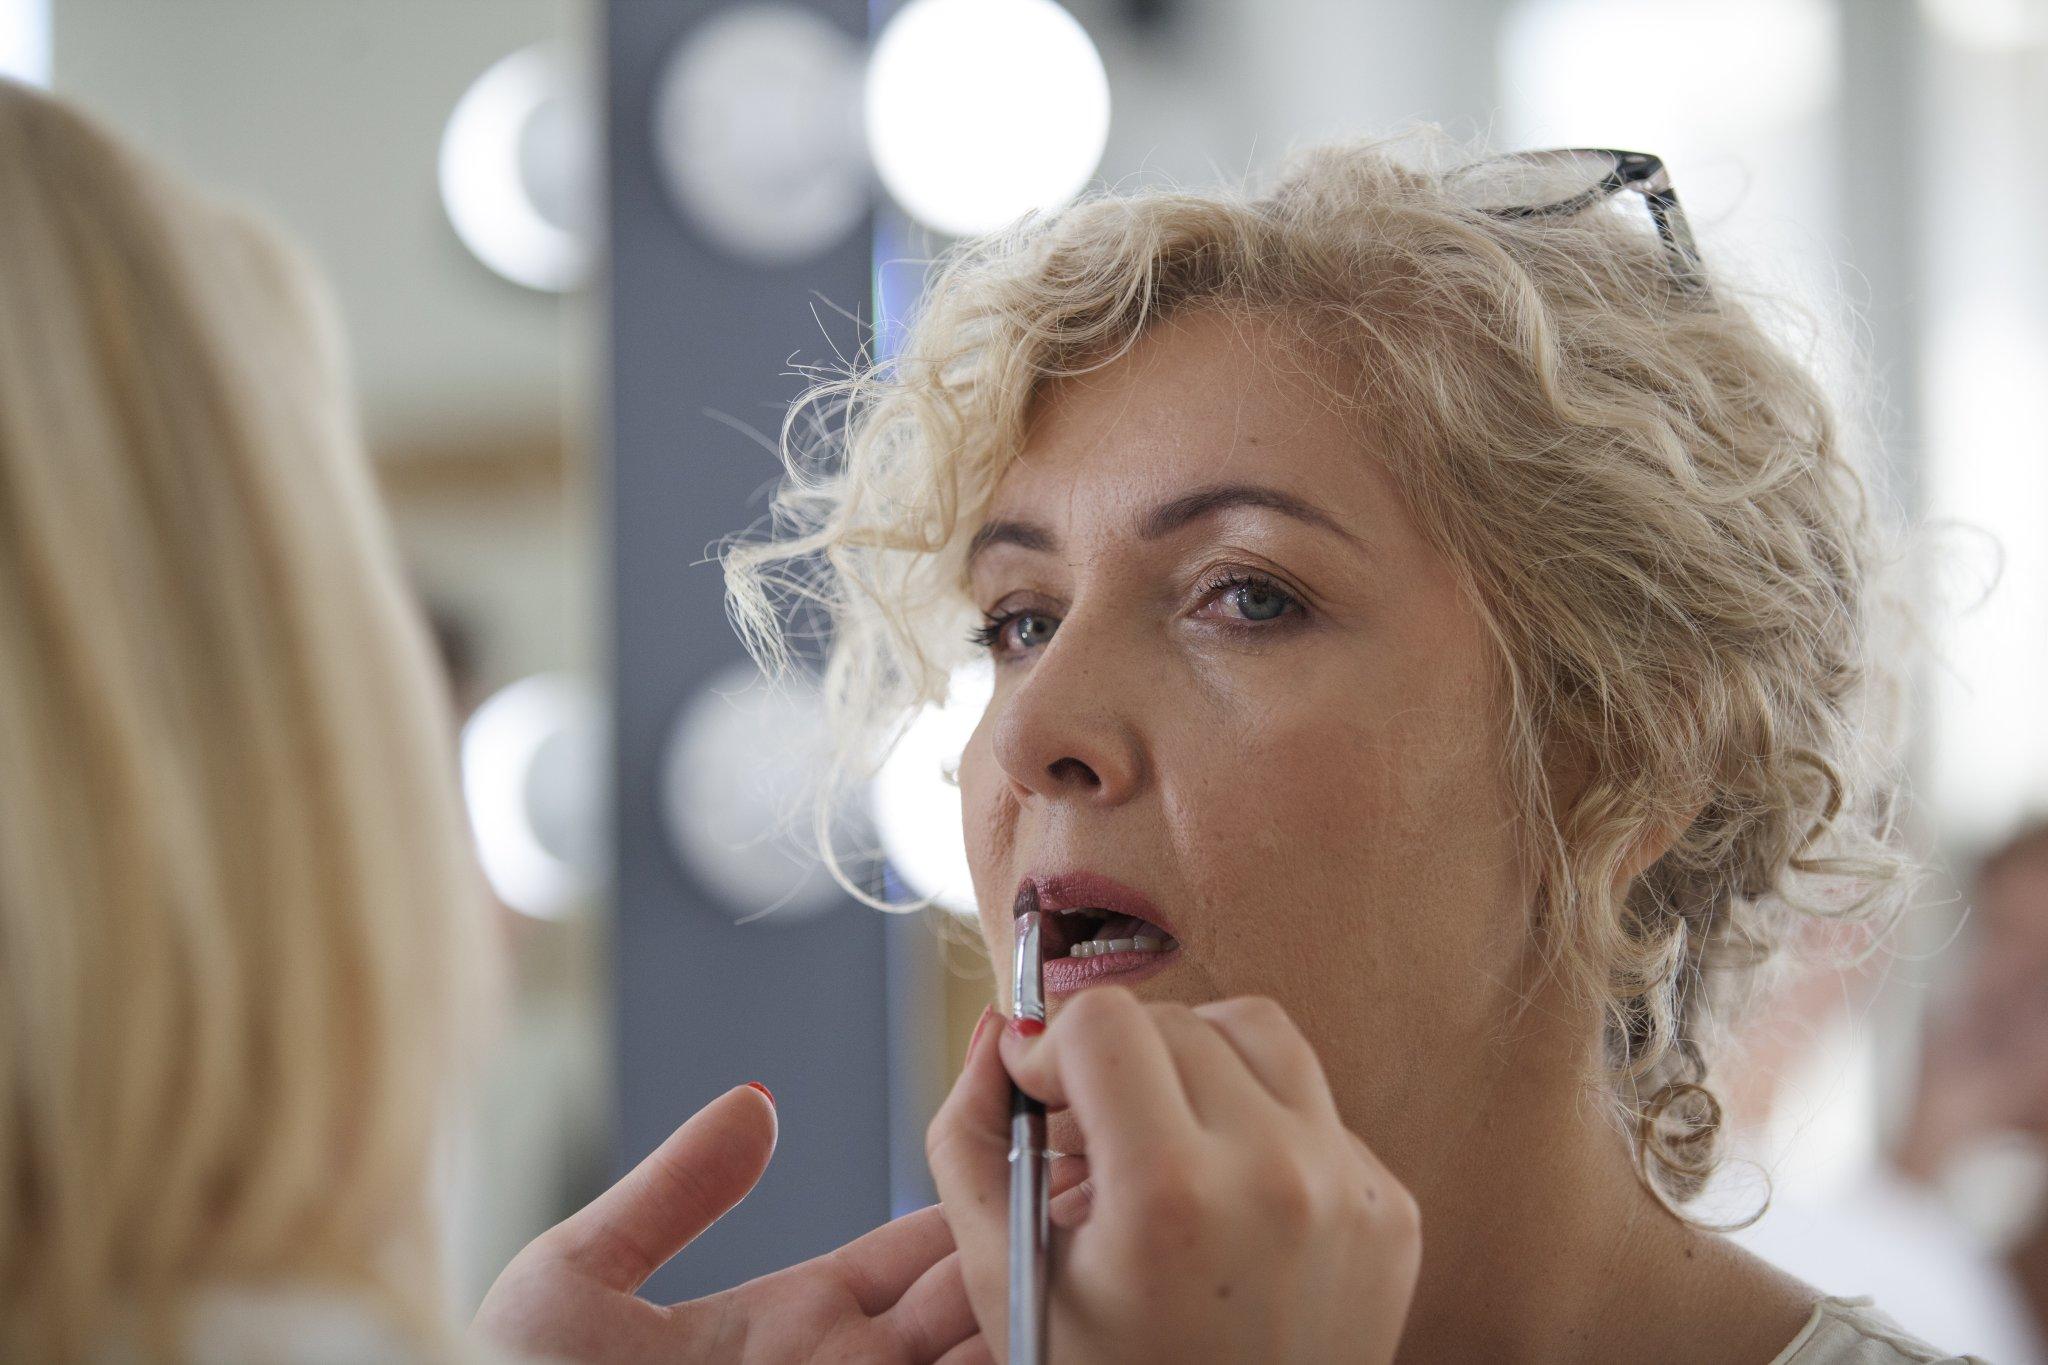 1. stupanj tečaja šminkanja